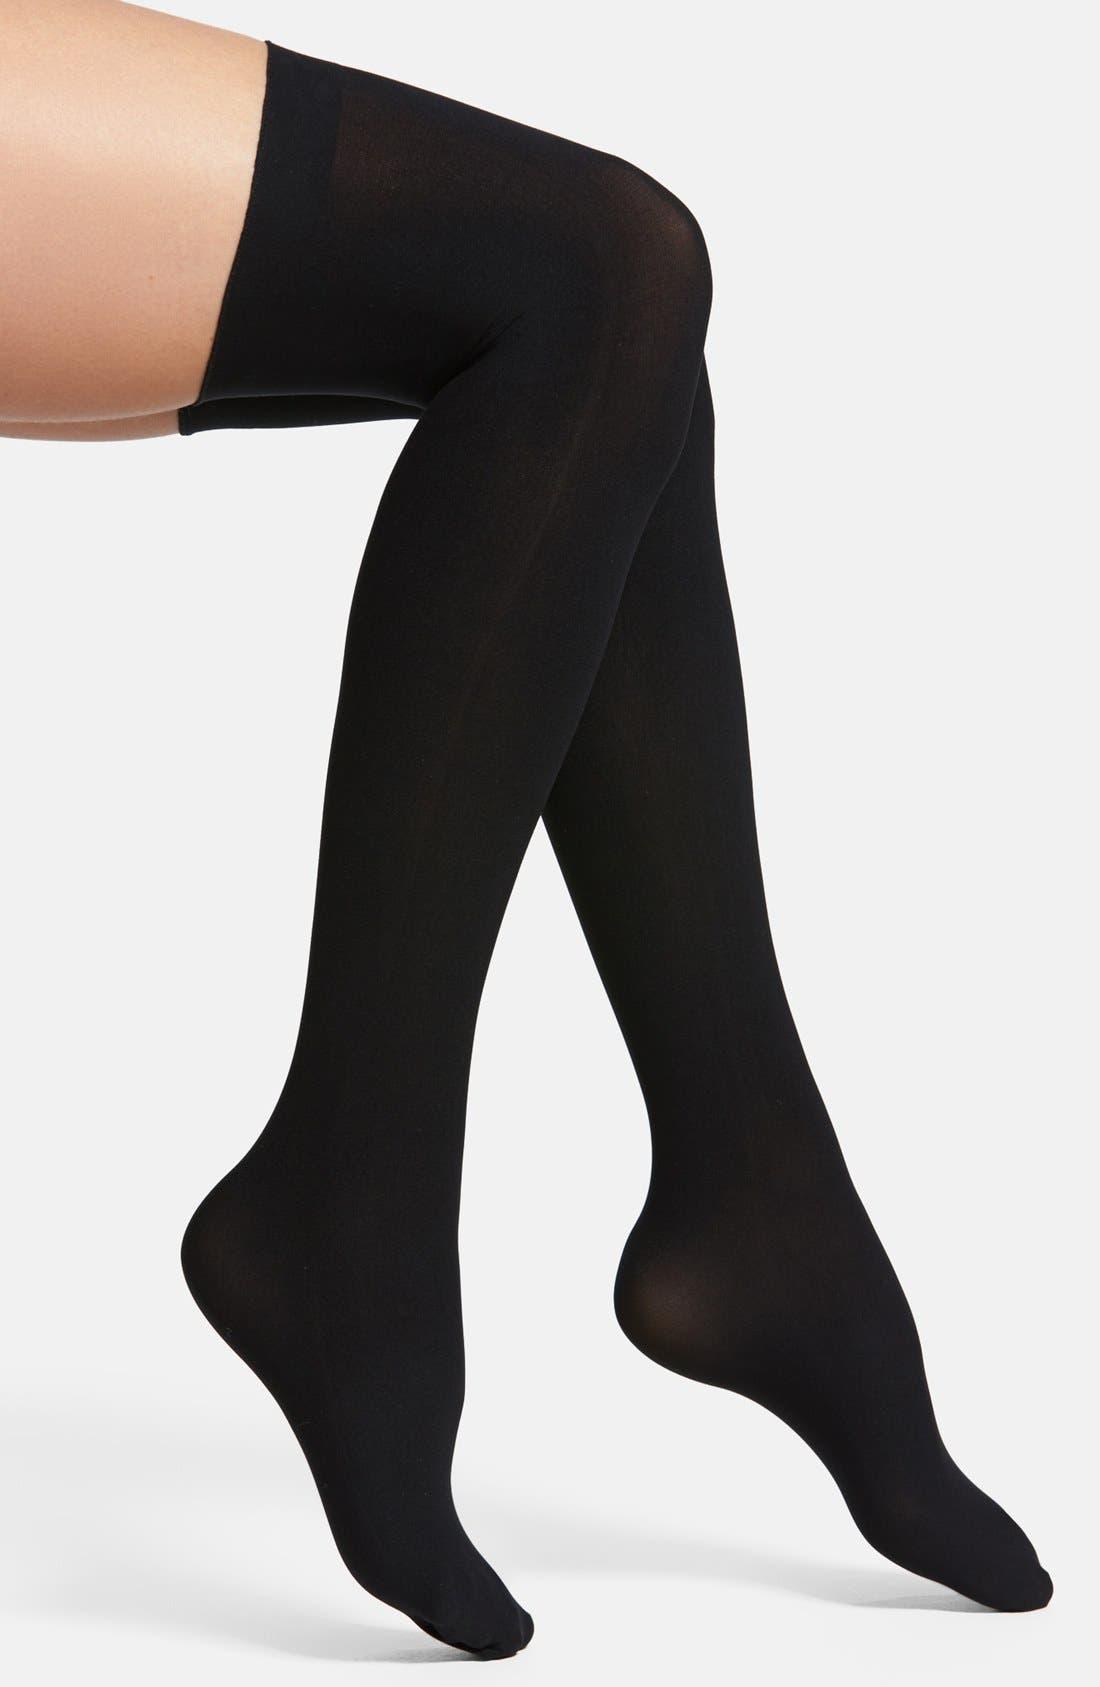 COMMANDO Up All Night Thigh High Socks, Main, color, BLACK